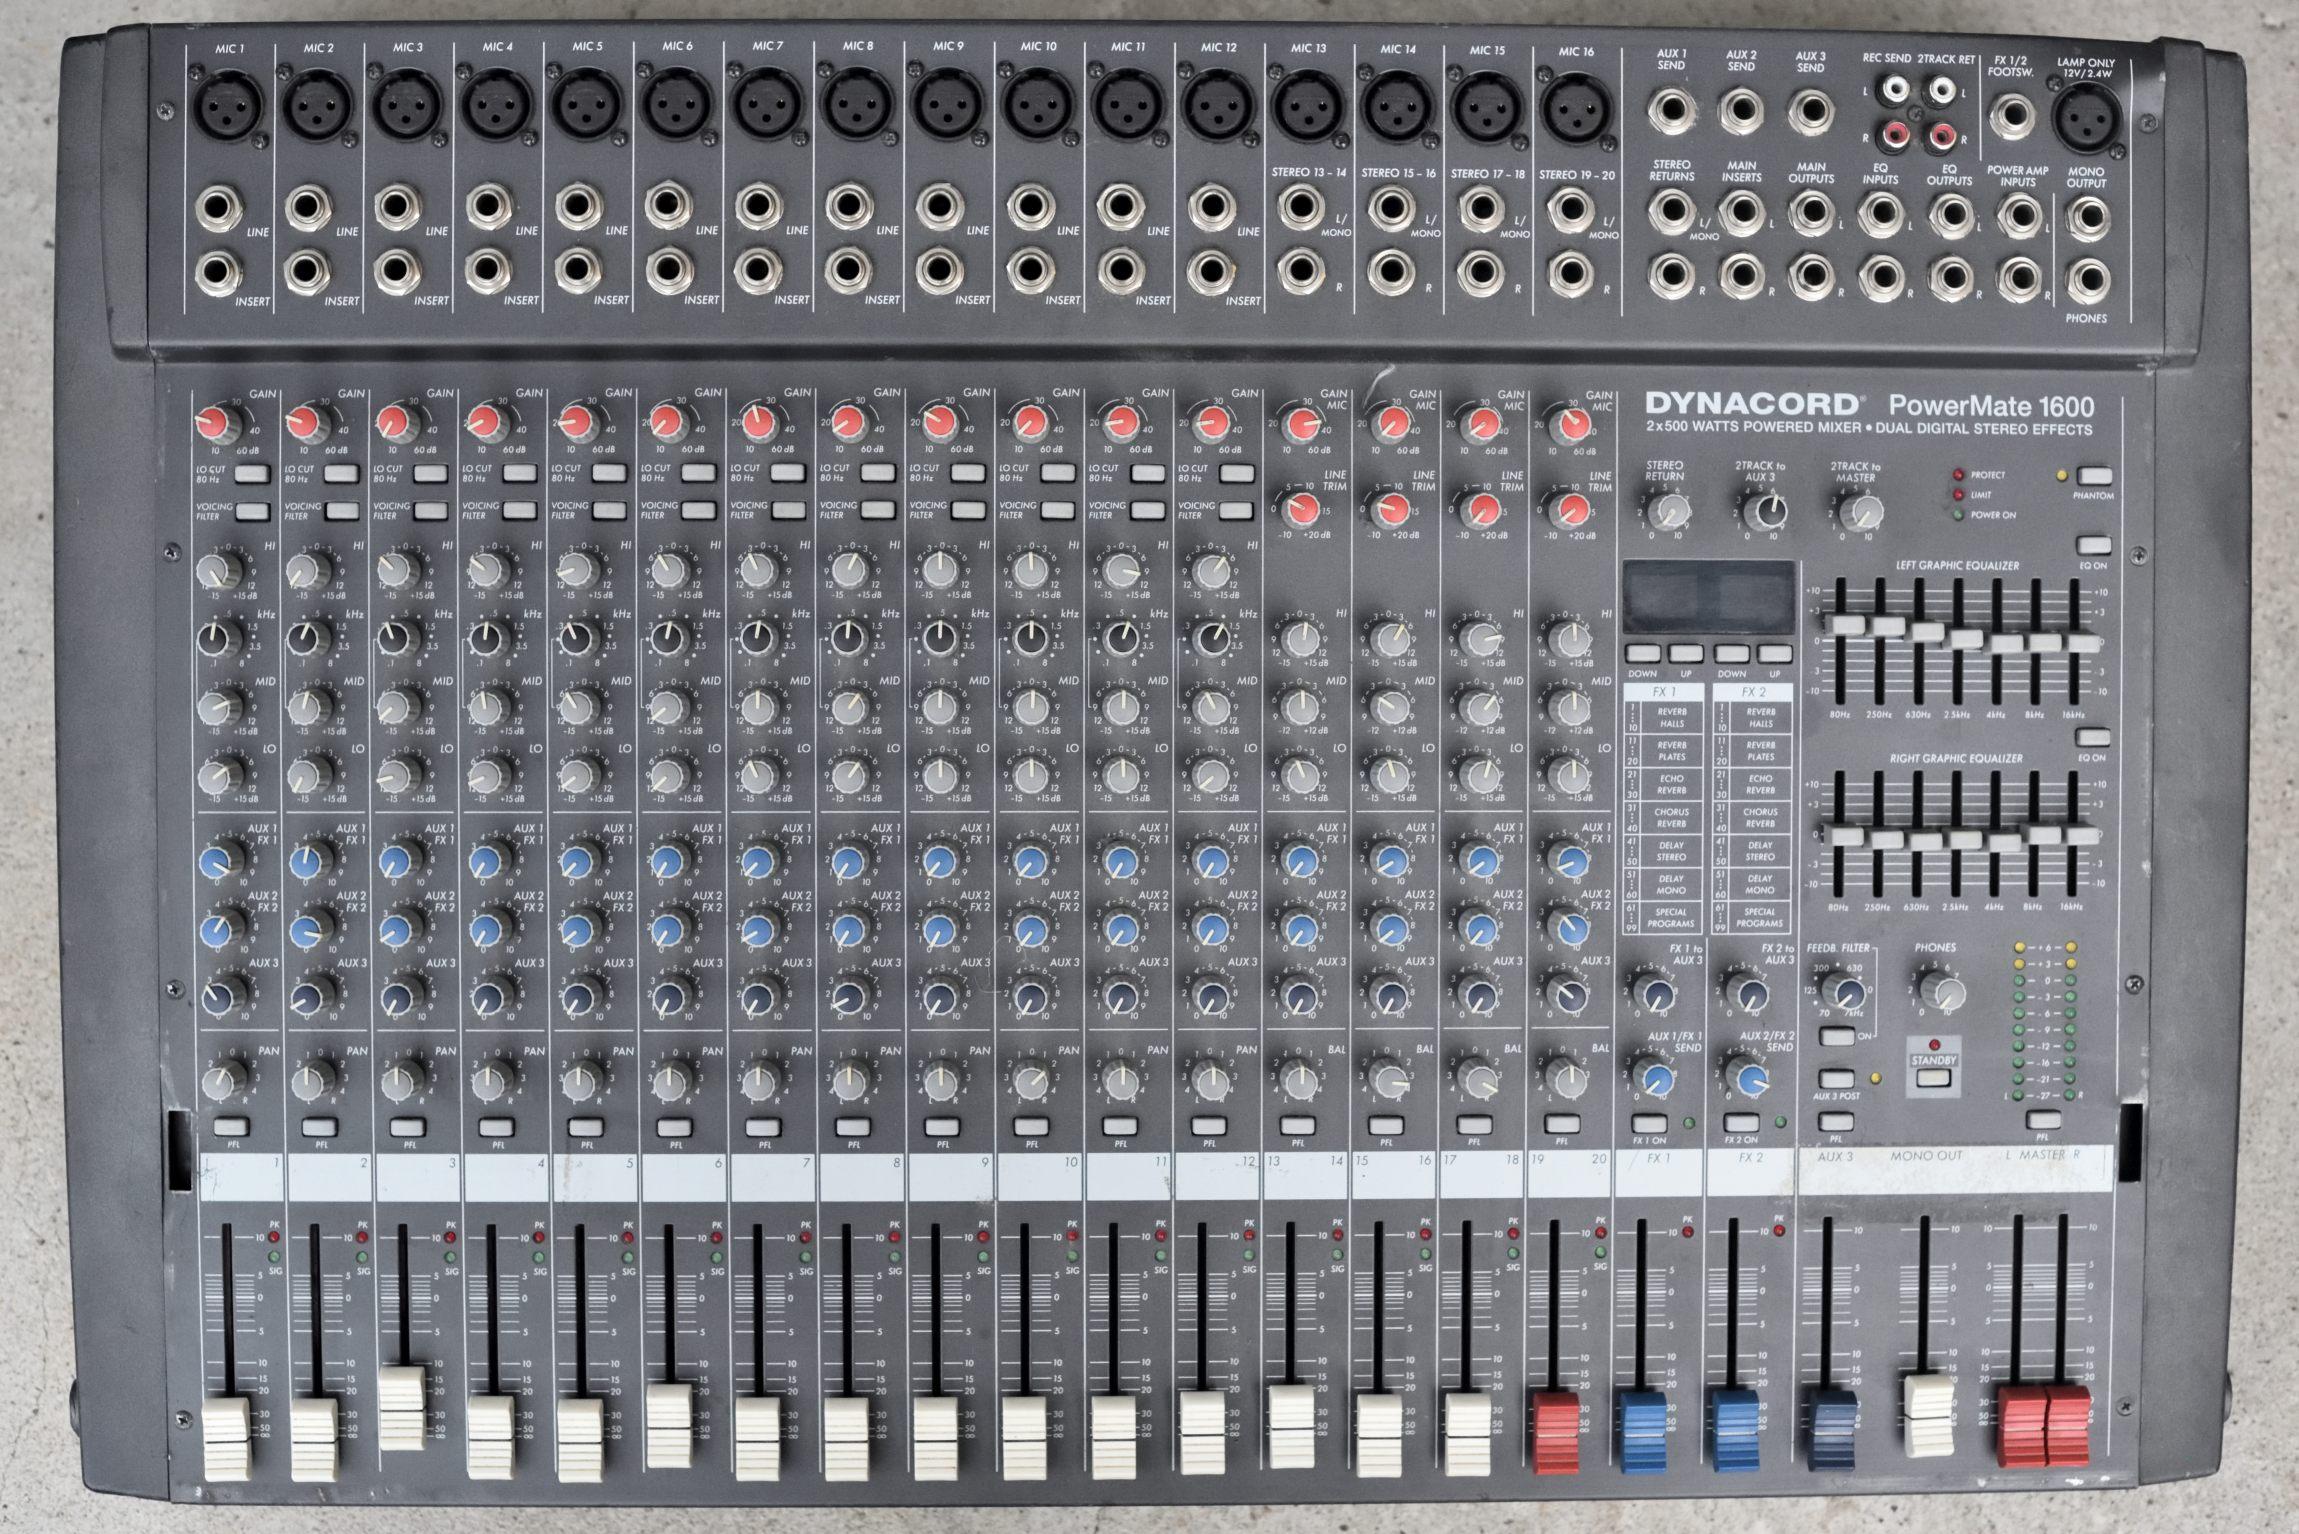 Powermate 1600 dynacord powermate 1600 audiofanzine - Table de mixage dynacord occasion ...